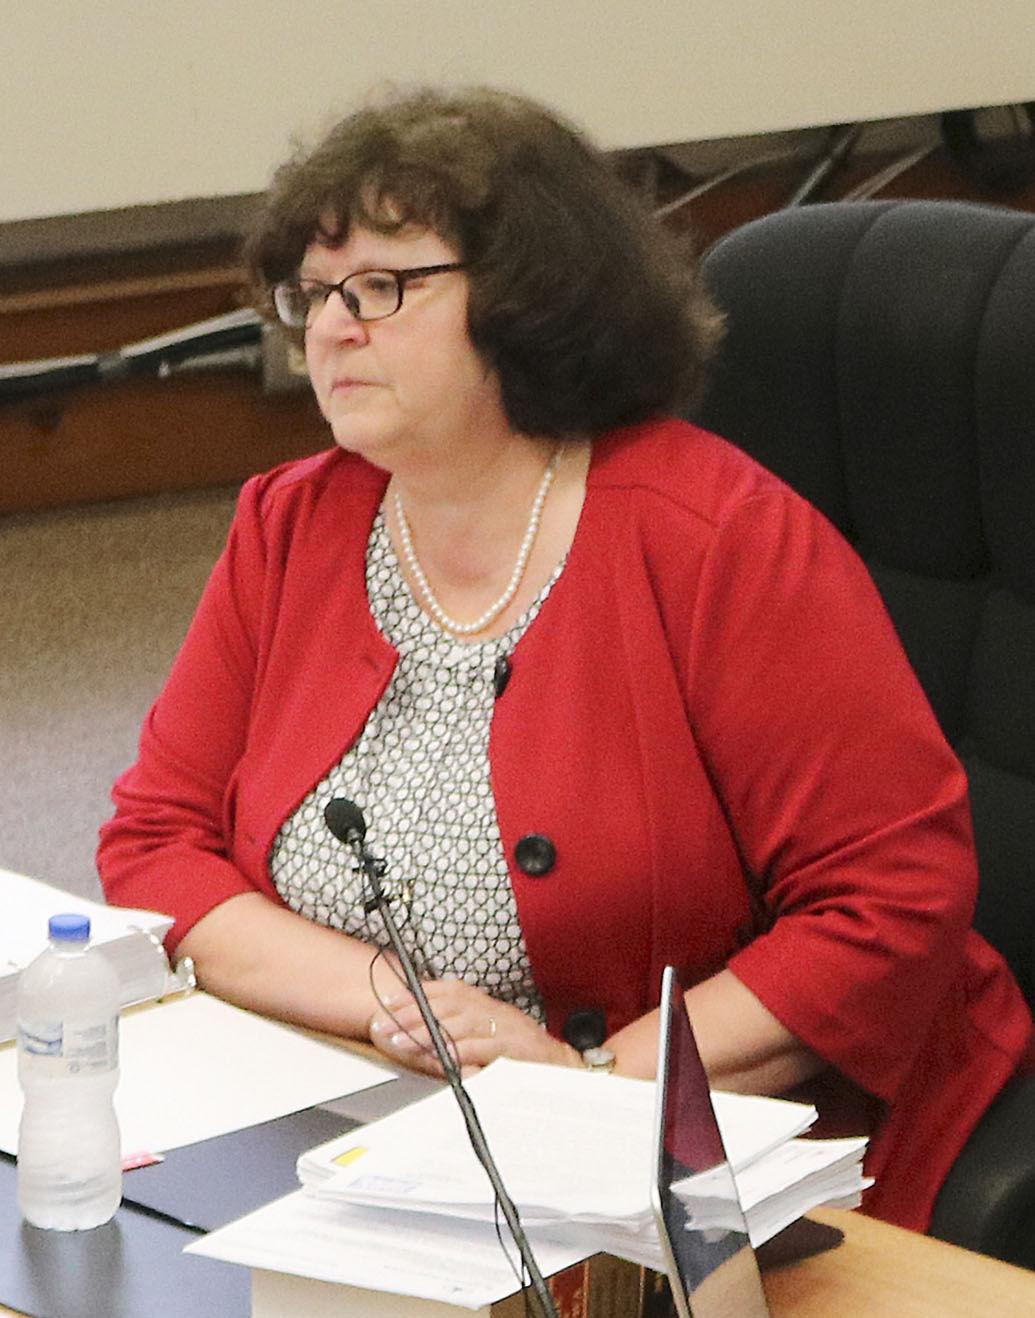 Mayor hearing - Broderson